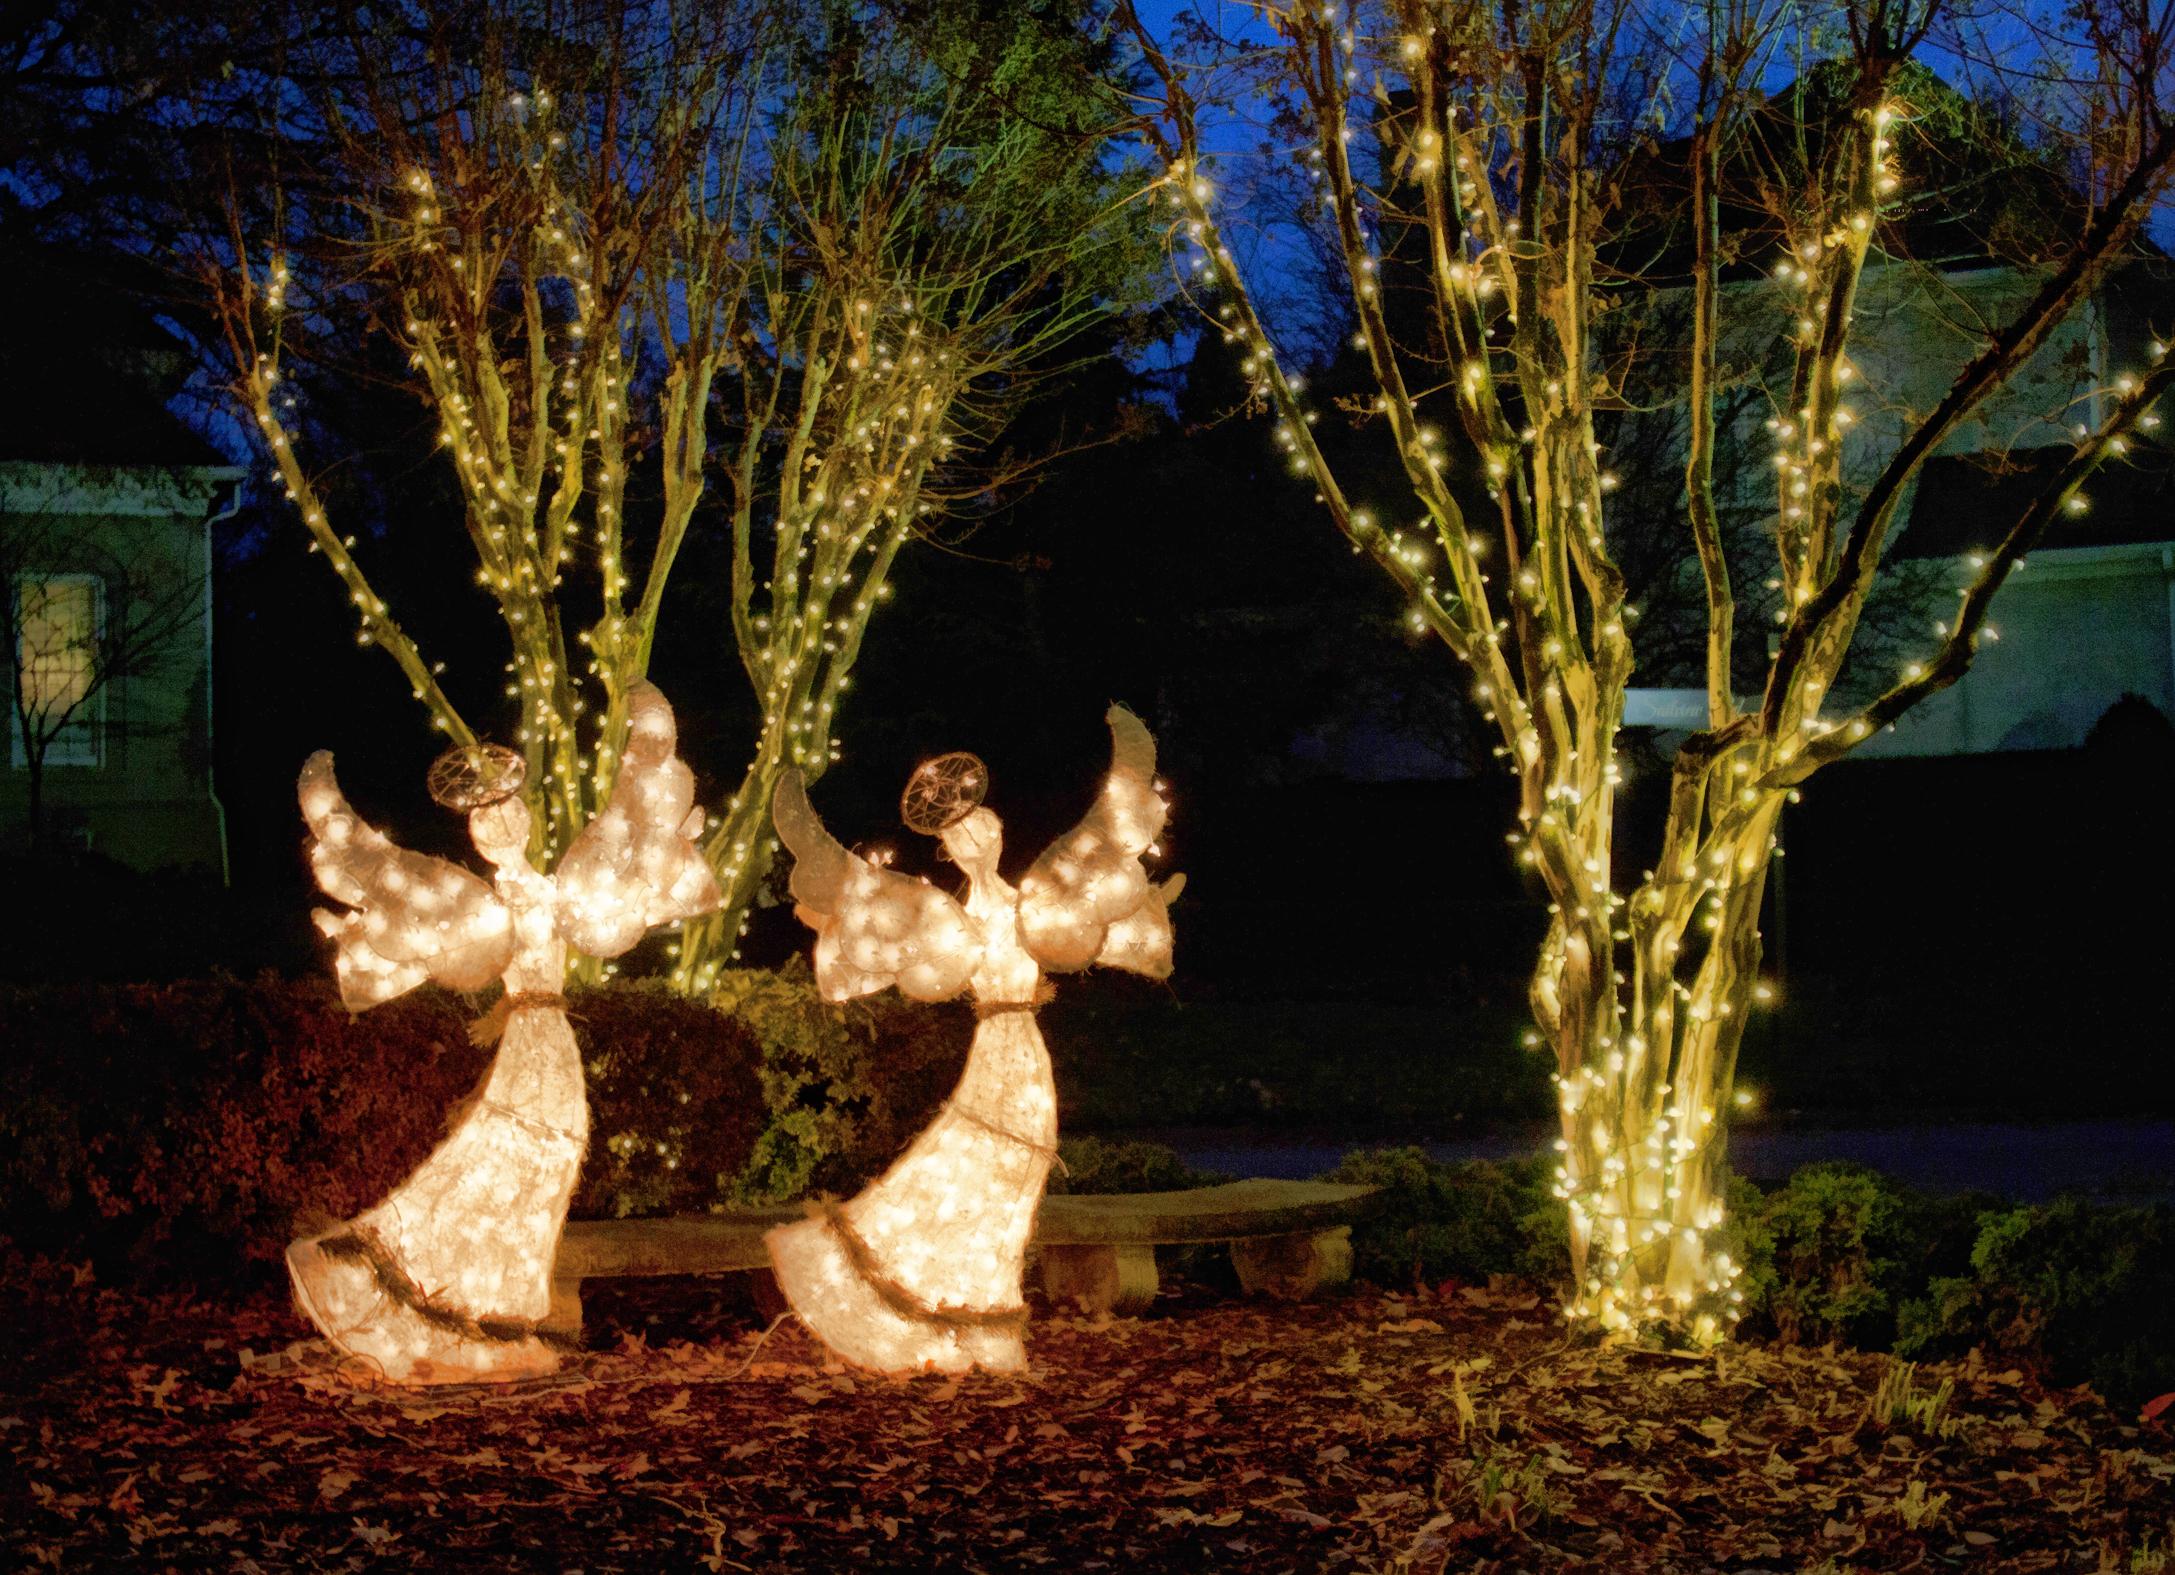 Birkdale Christmas Tree Lighting 2021 Lake Norman Christmas Light Up Cornelius Lighted Boat Parade